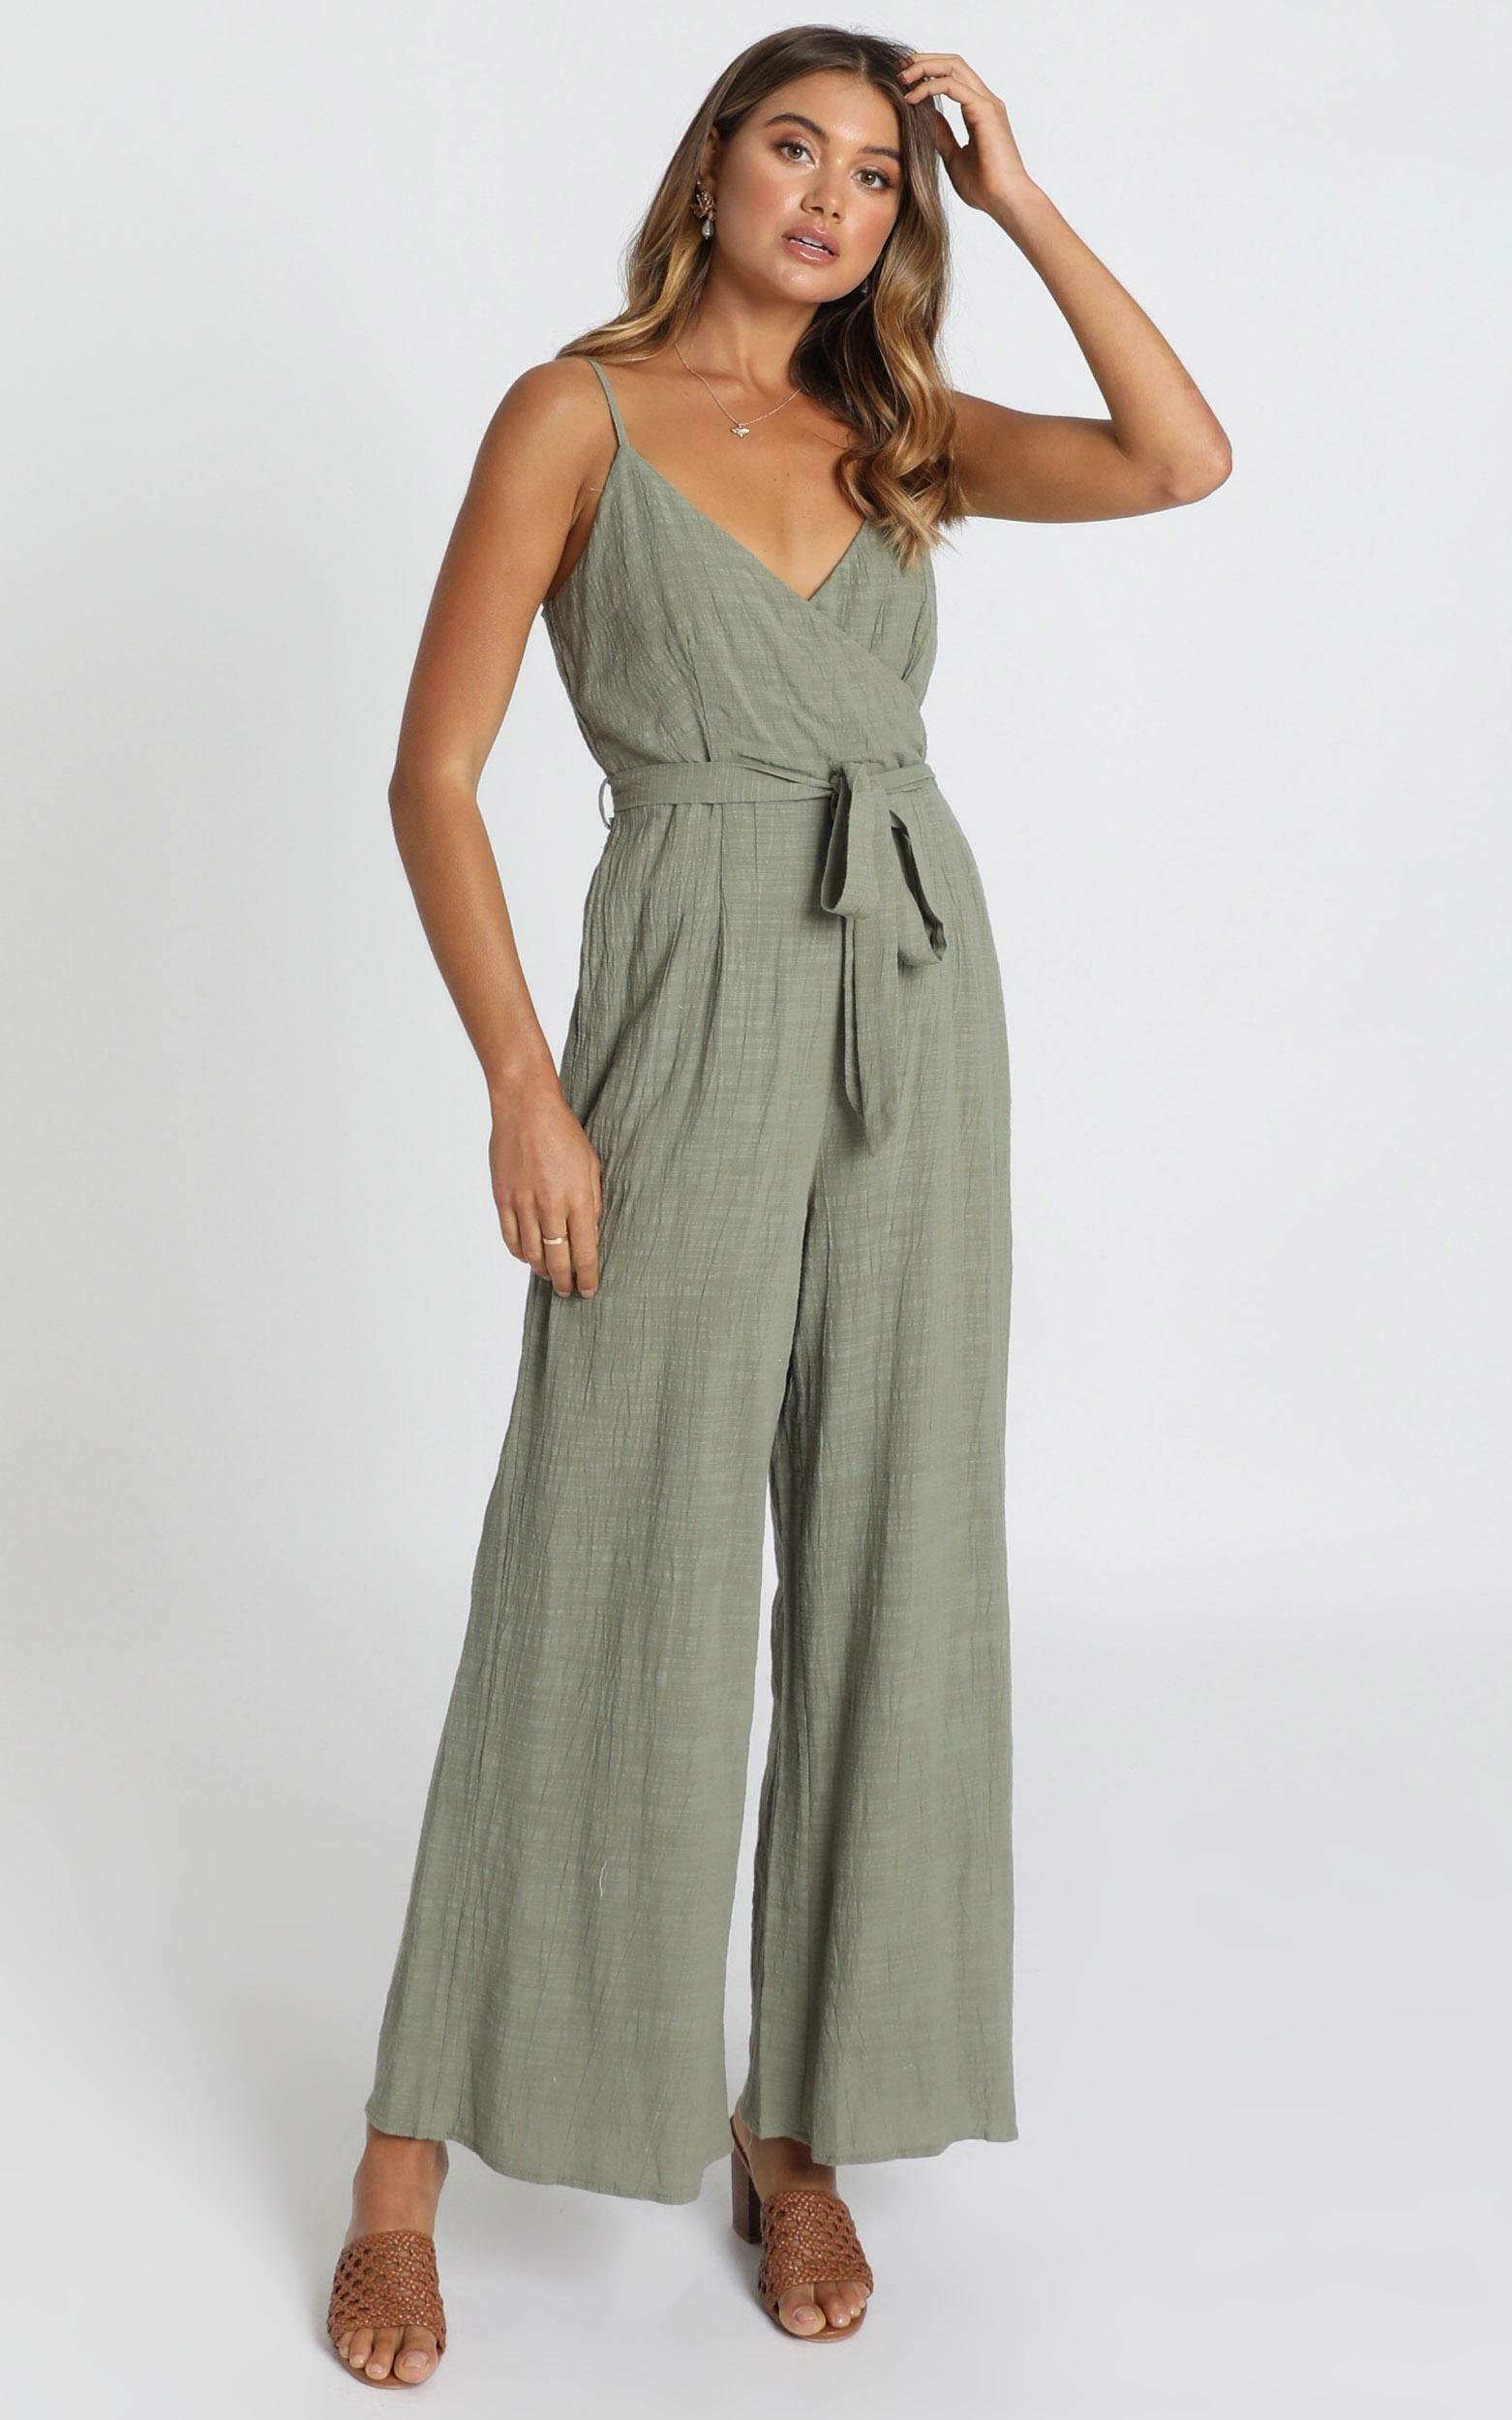 Farah Jumpsuit in khaki linen look - 12 (L), Khaki, hi-res image number null